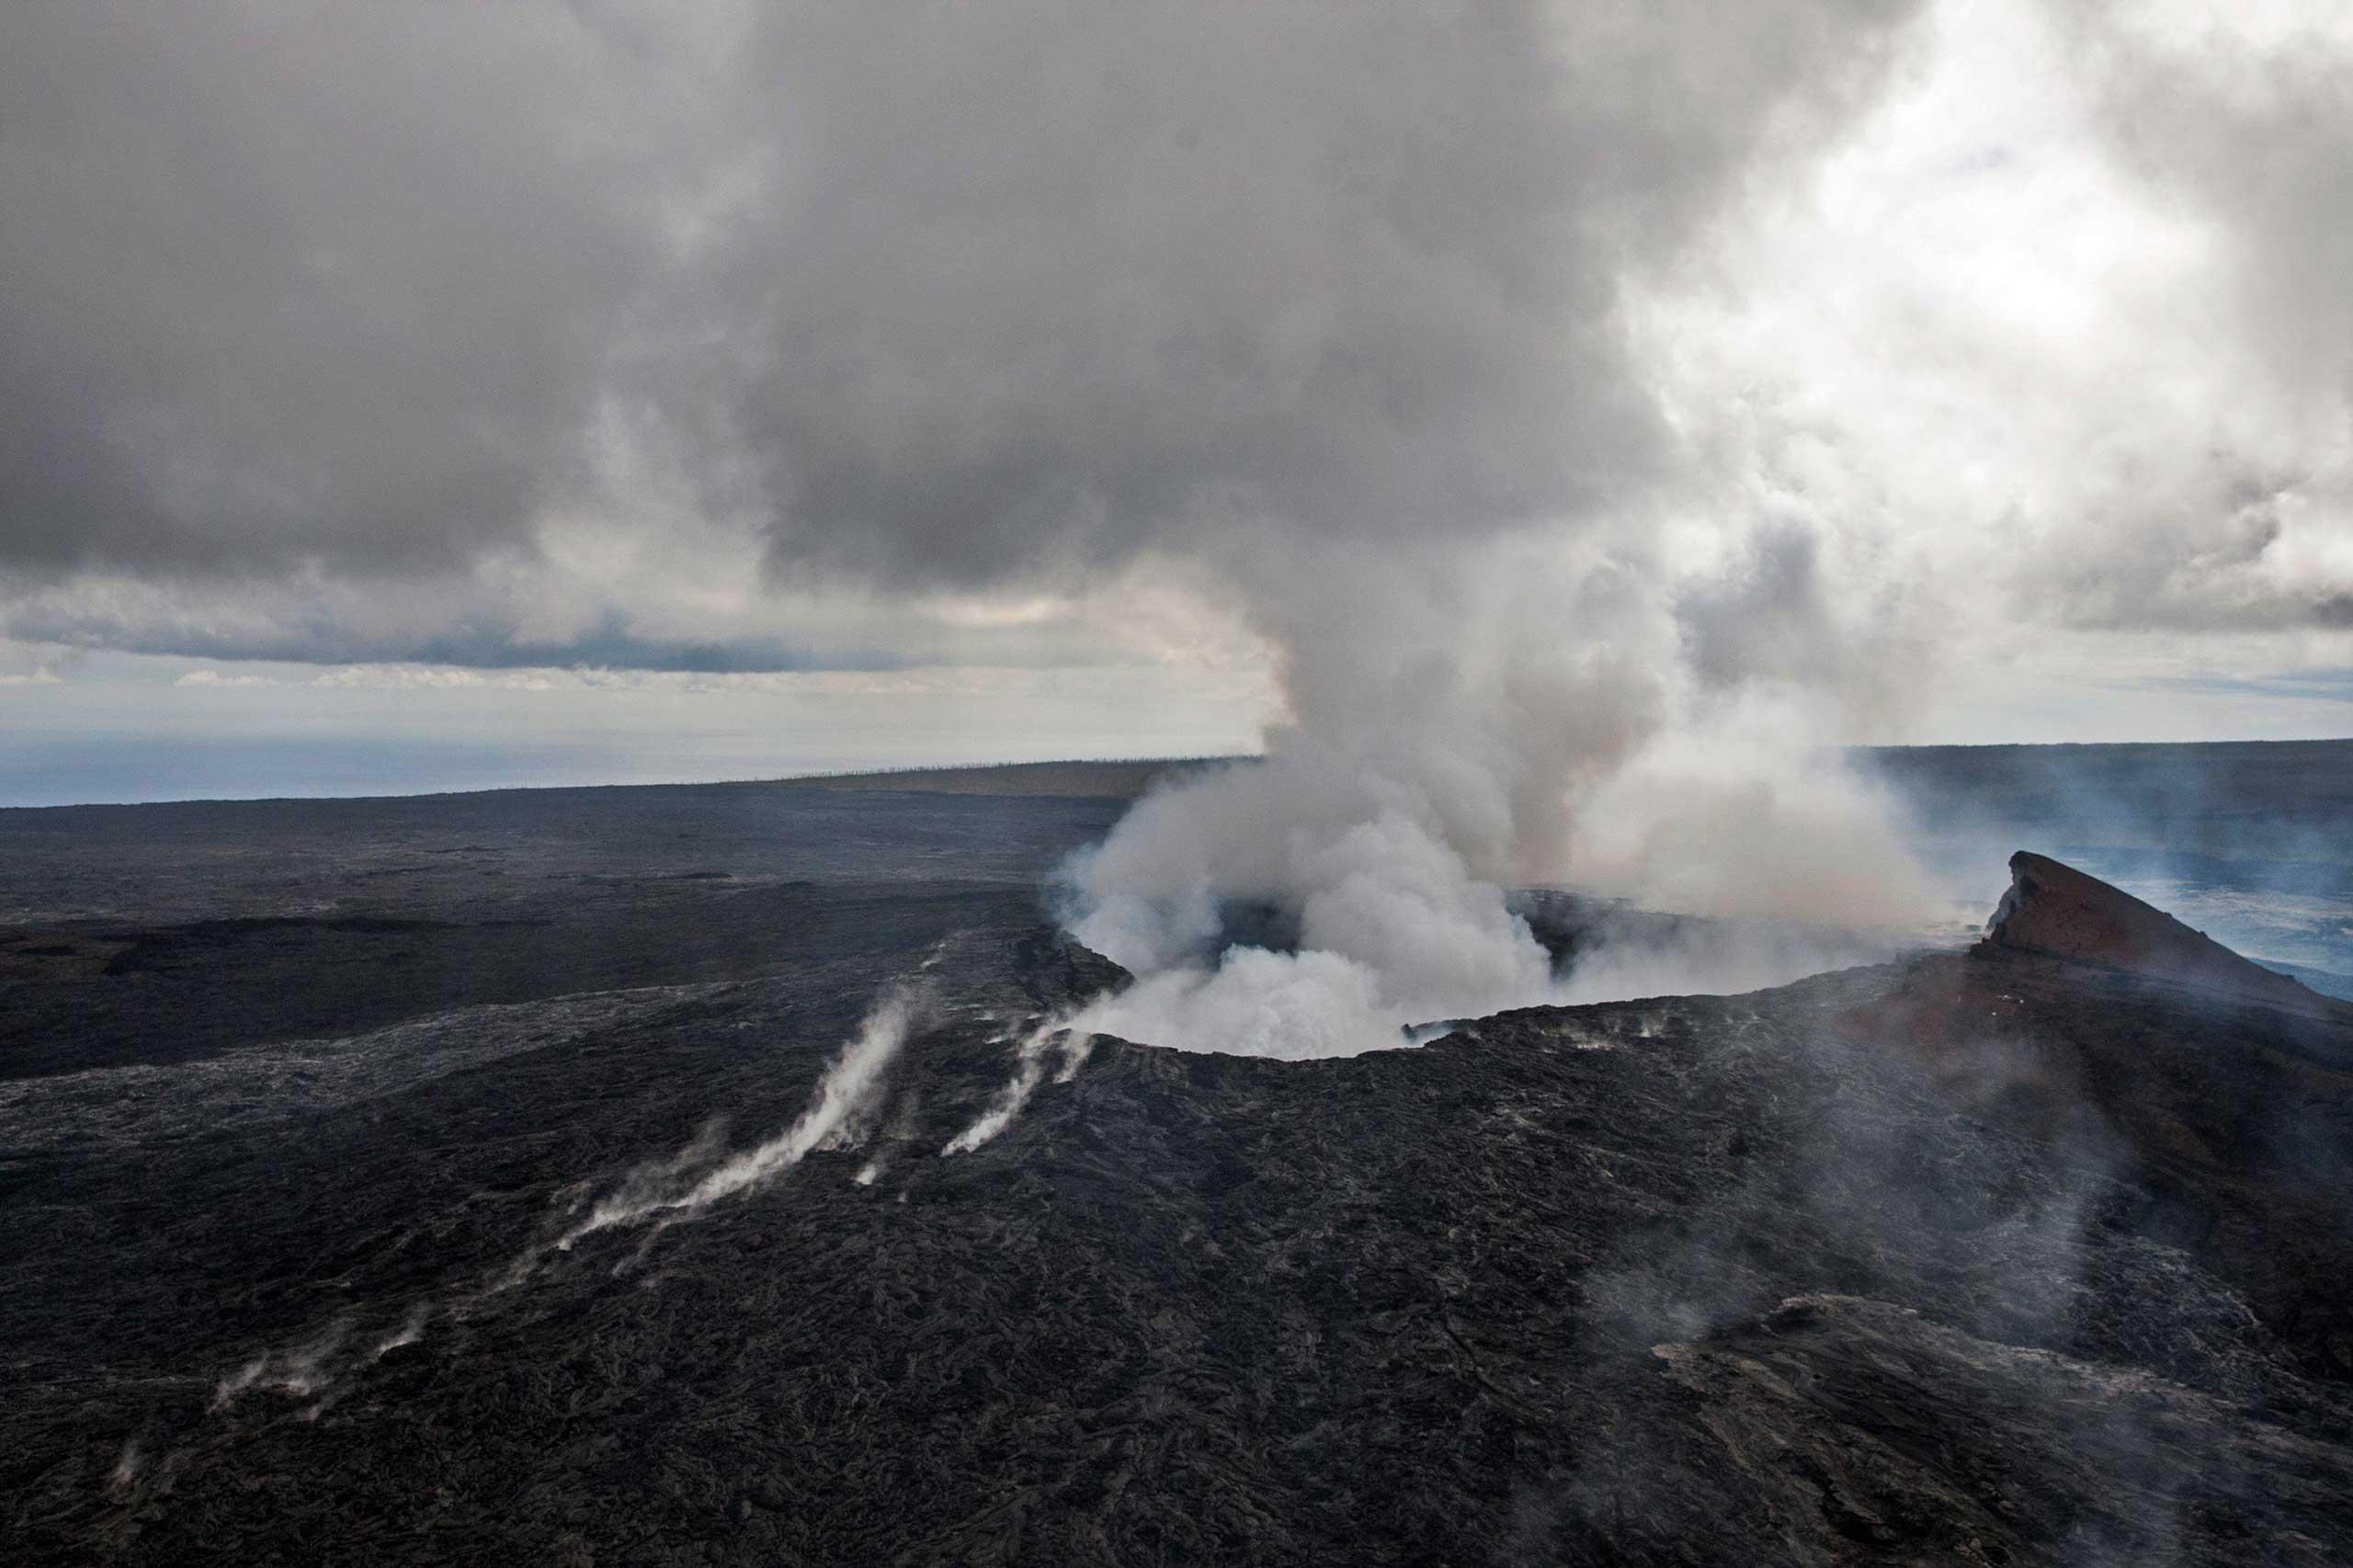 Smoke rises from the  Pu'u O'o vent on the Kilauea Volcano on the Big Island of Hawaii on Oct. 29, 2014.